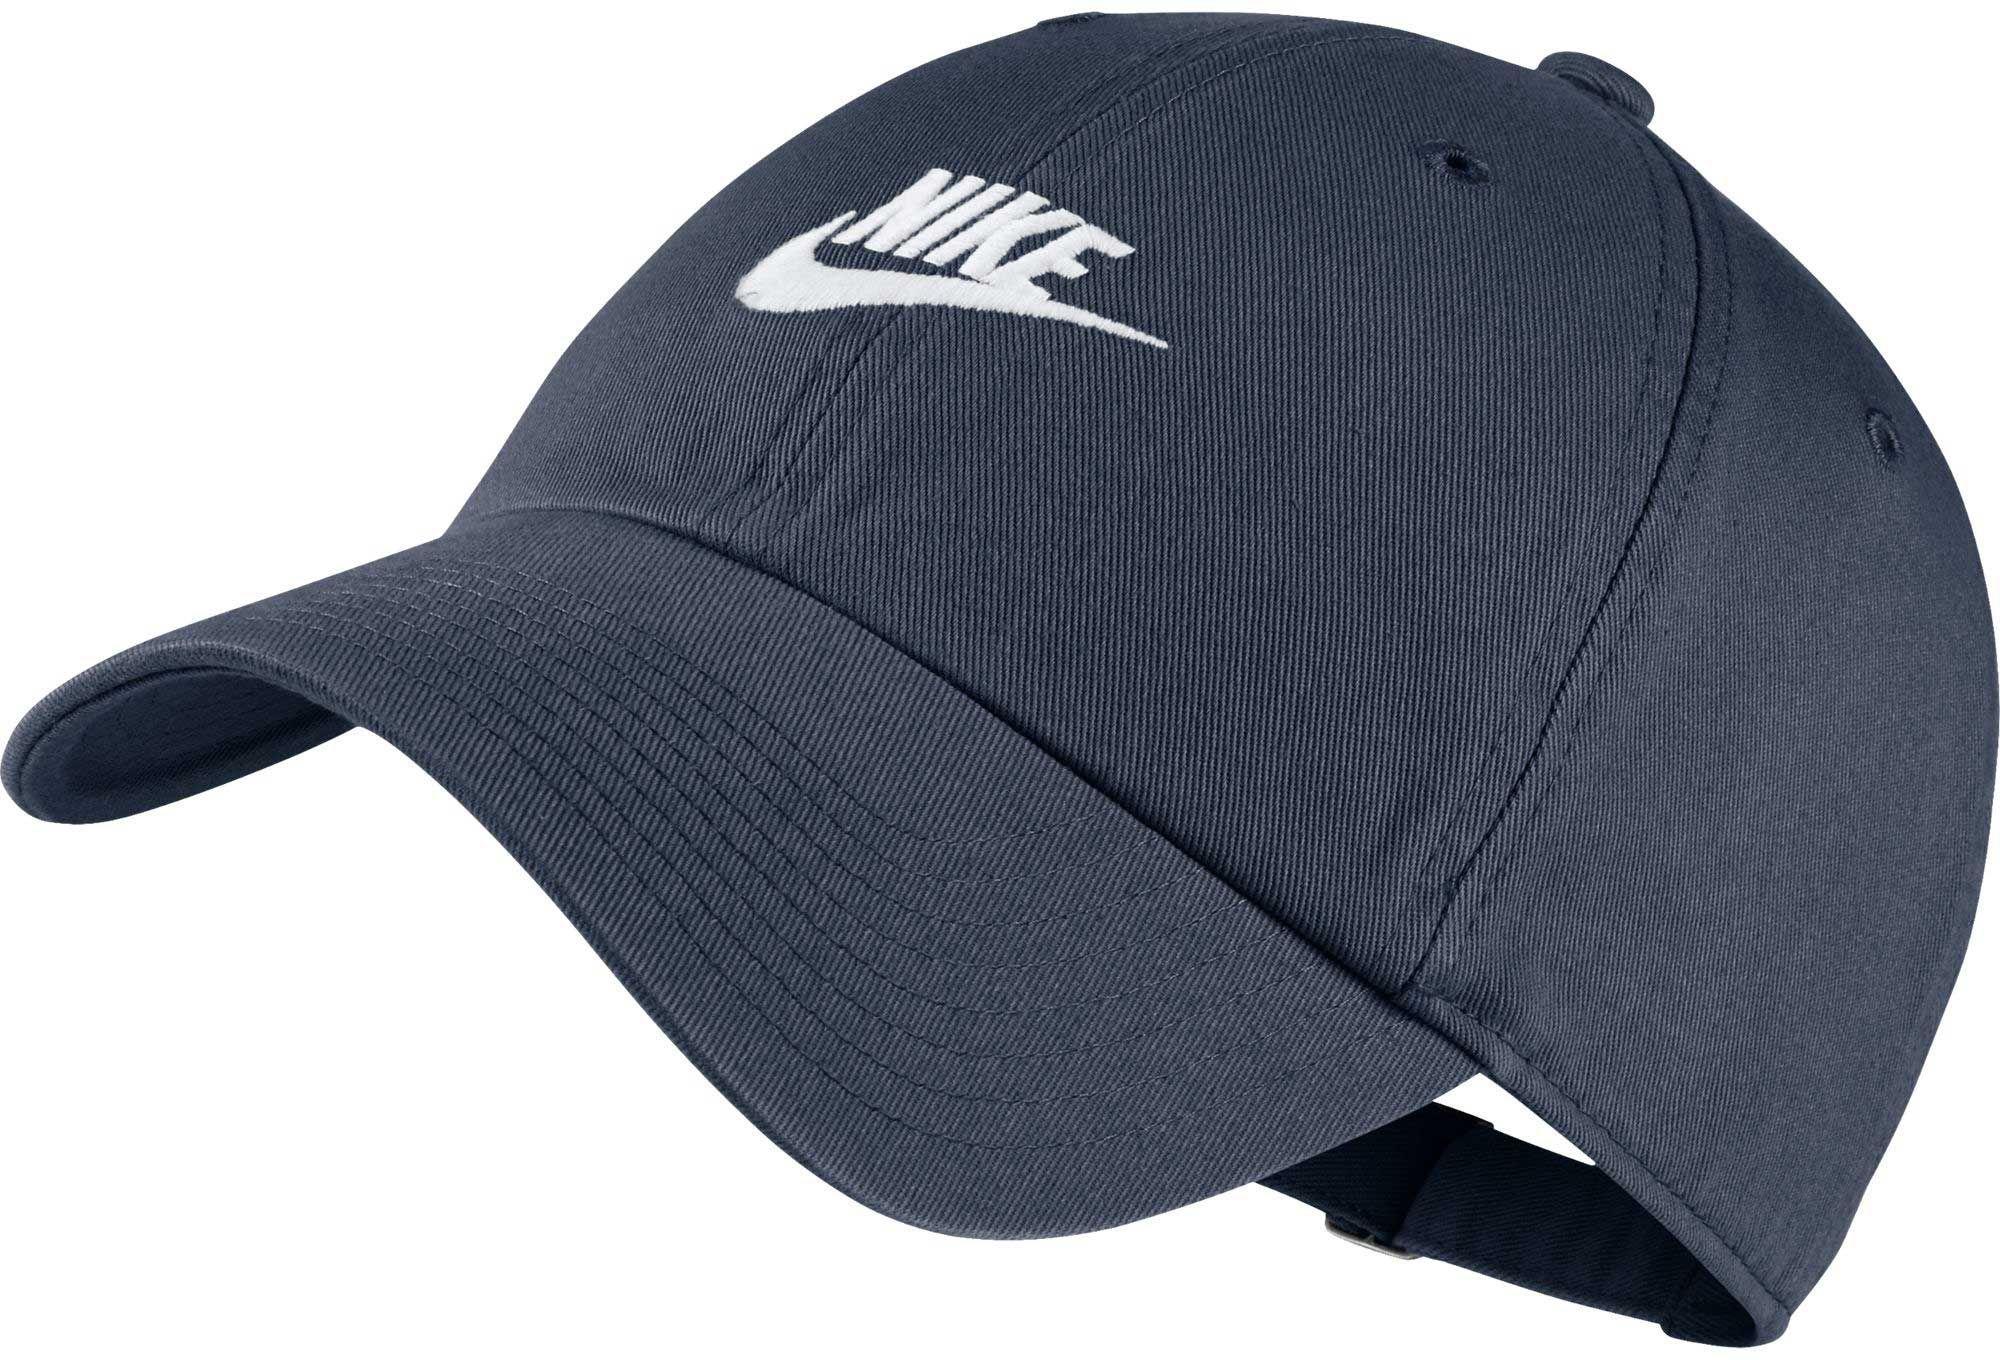 official photos f6fed 64f05 Nike Sportswear H86 Cotton Twill Adjustable Hat, Blue